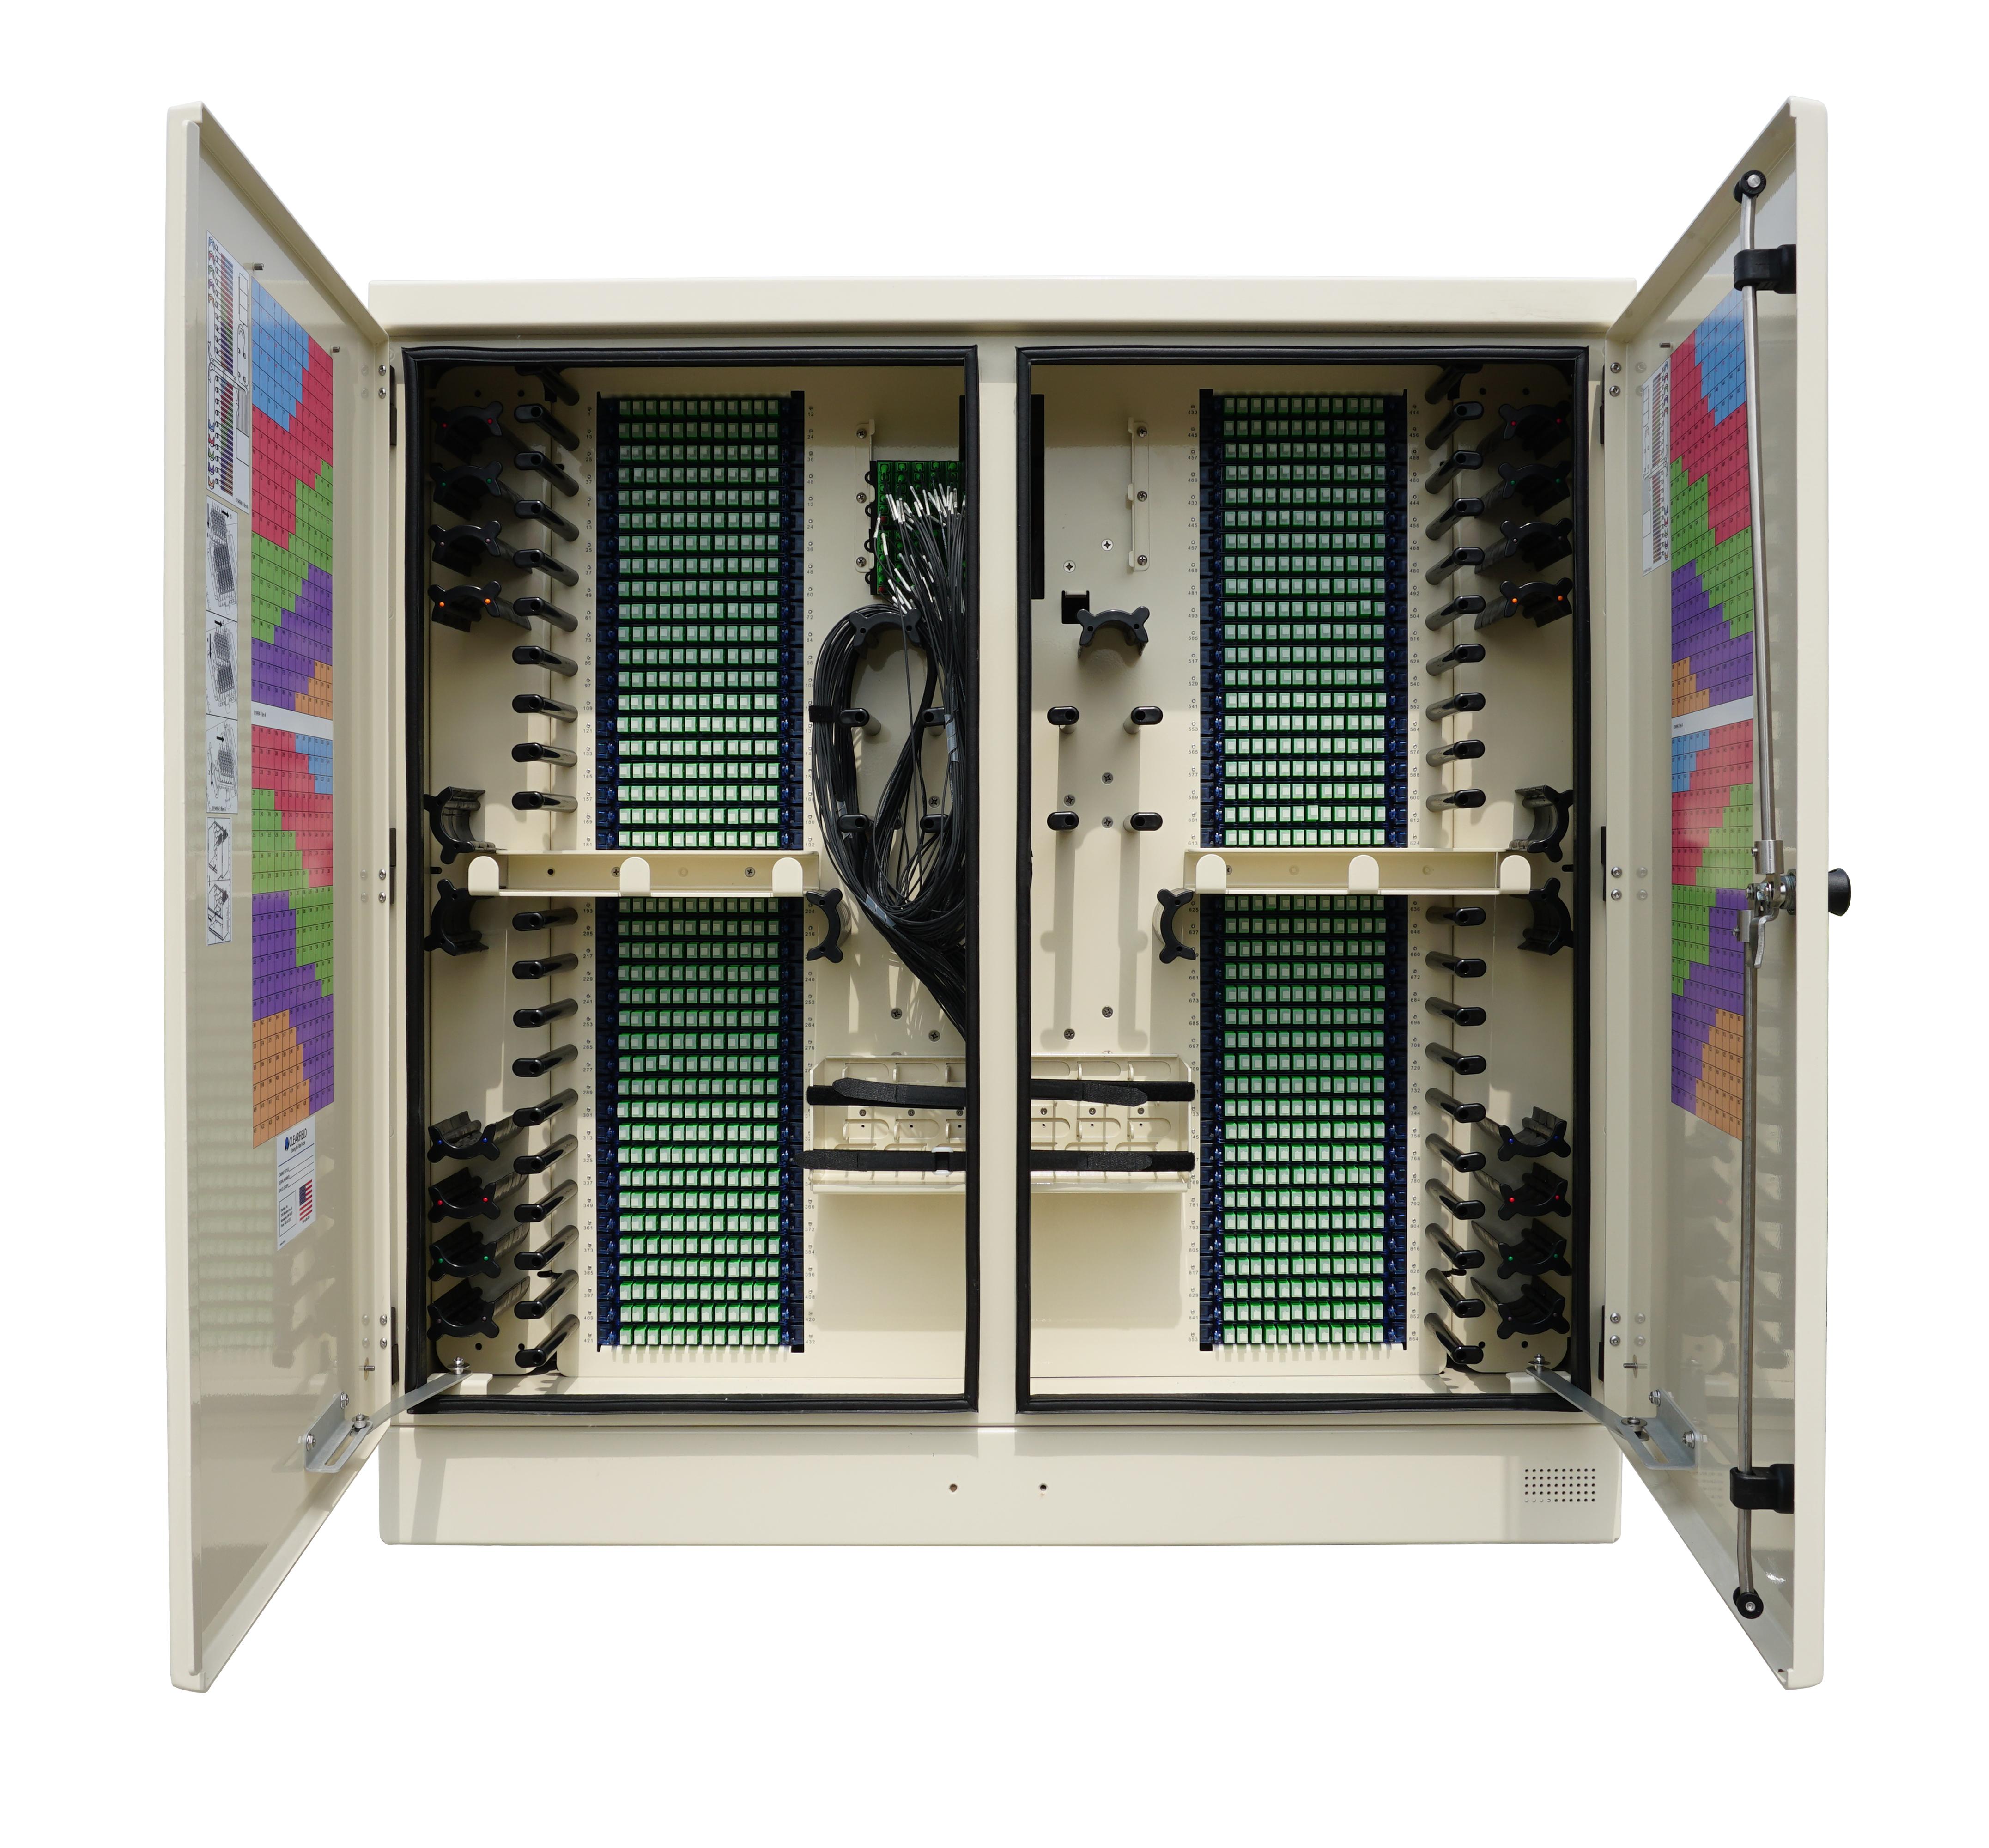 FieldSmart Fiber Distribution Hub (FDH) 864-Port PON Cabinet